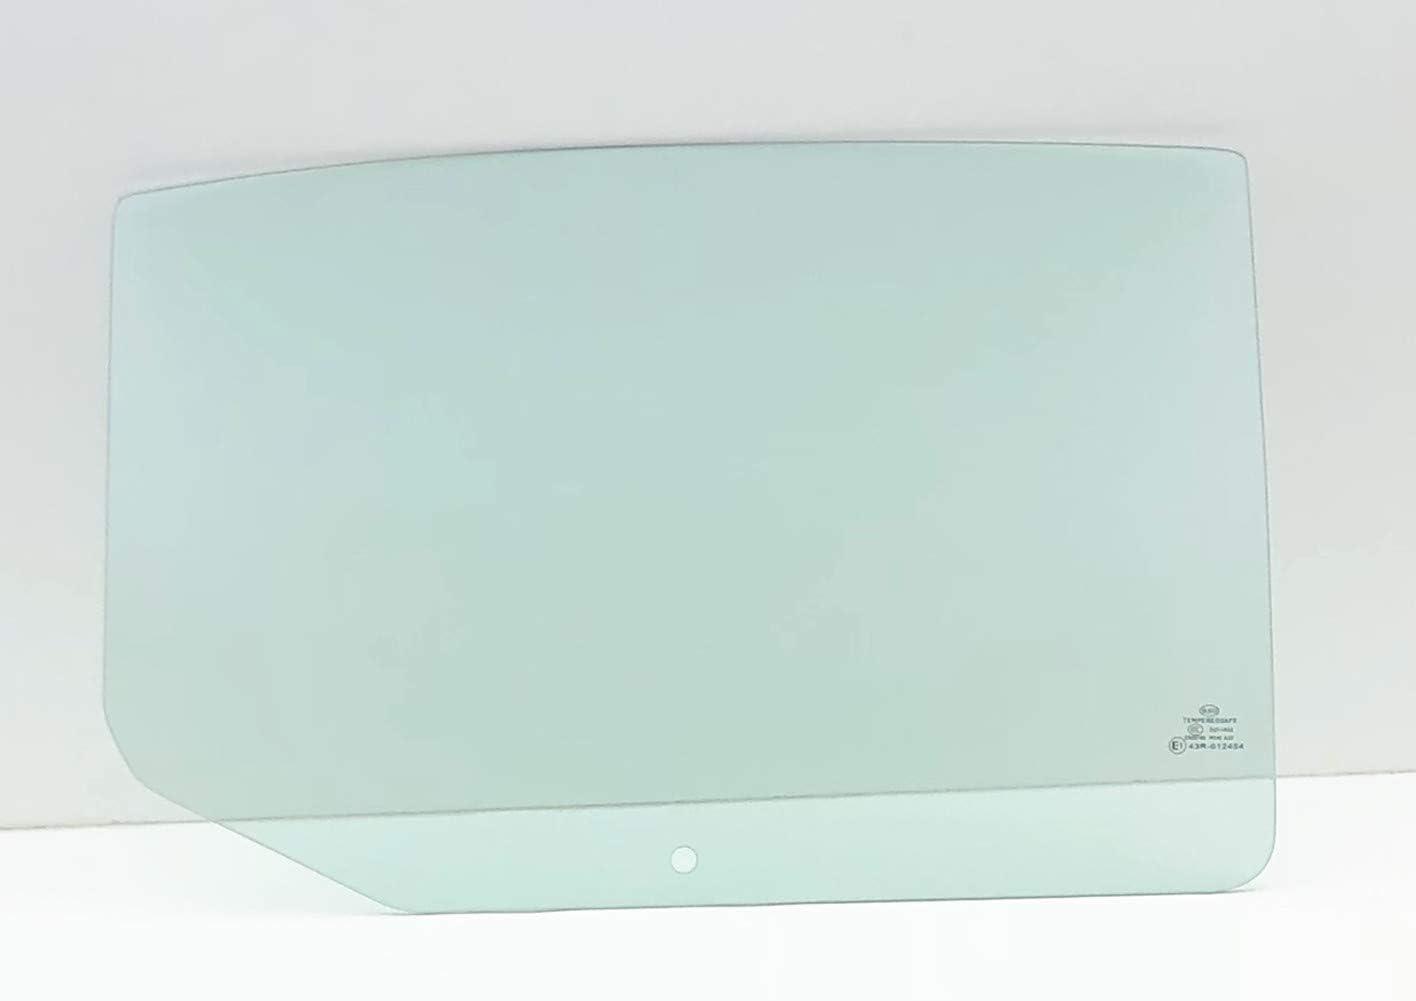 NAGD 限定モデル Passenger 安全 Right Side Rear Compatible Window Glass Door